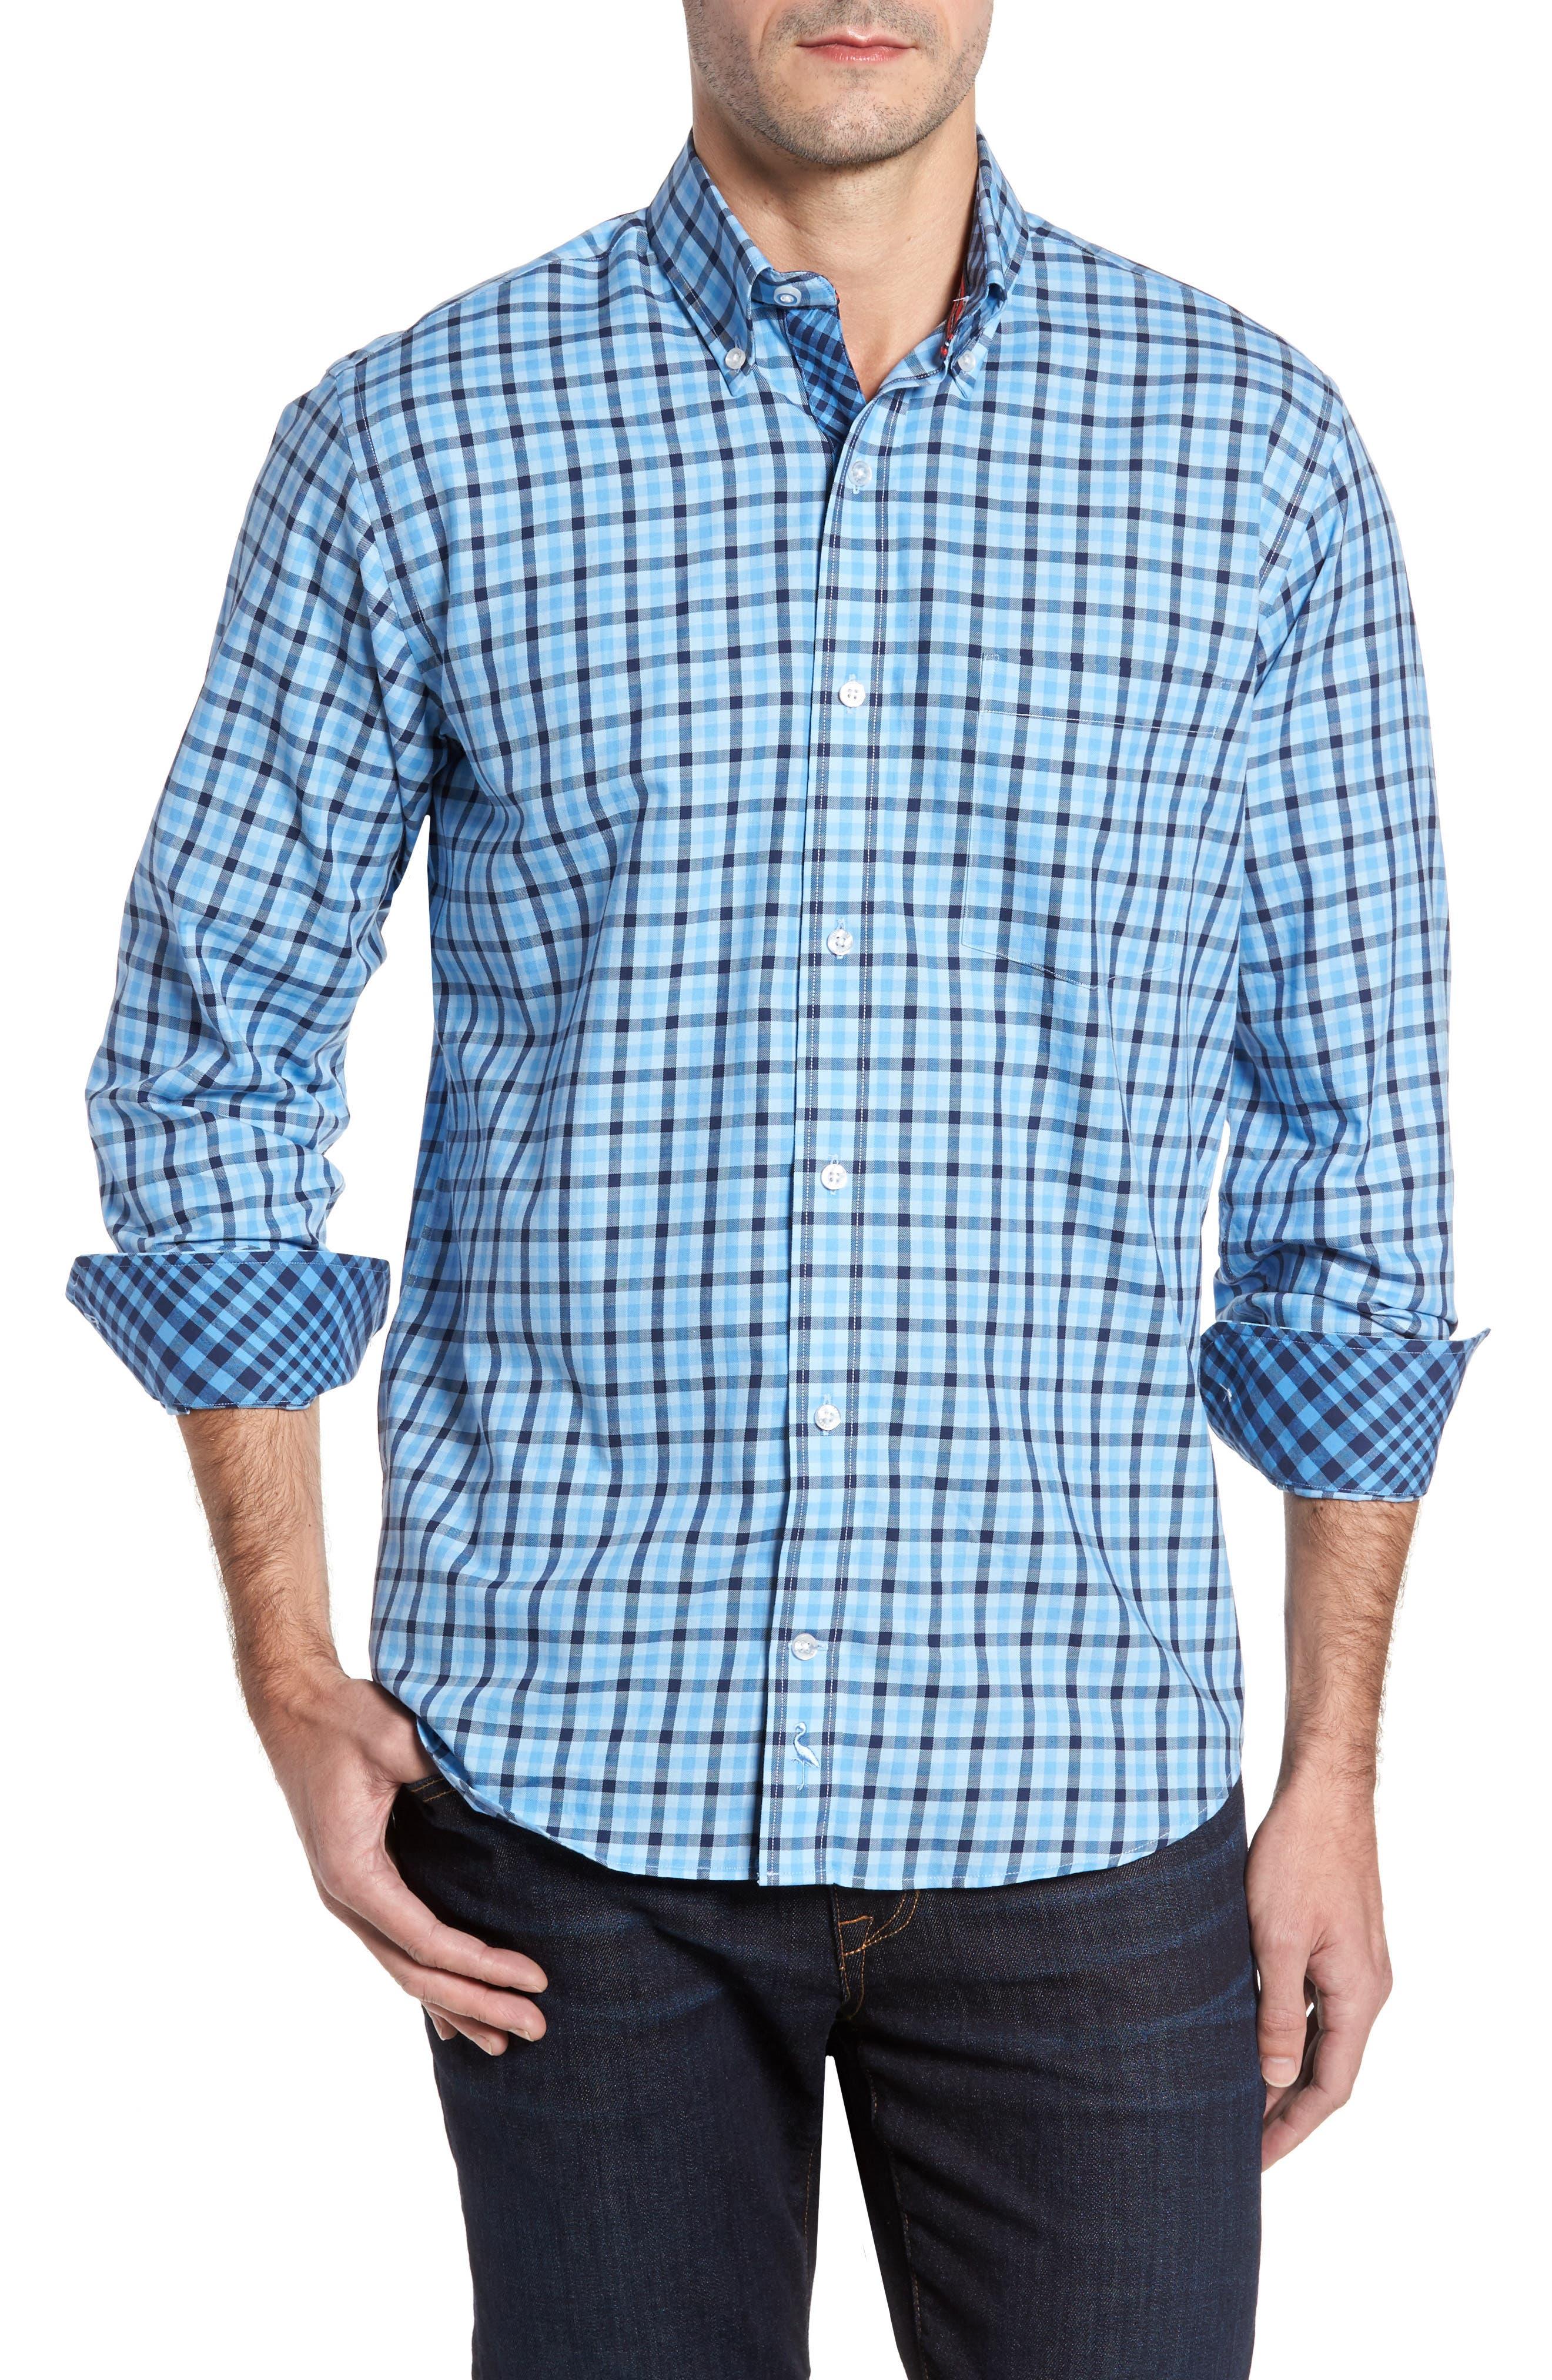 Bridge City Gingham Twill Sport Shirt,                         Main,                         color, Blue